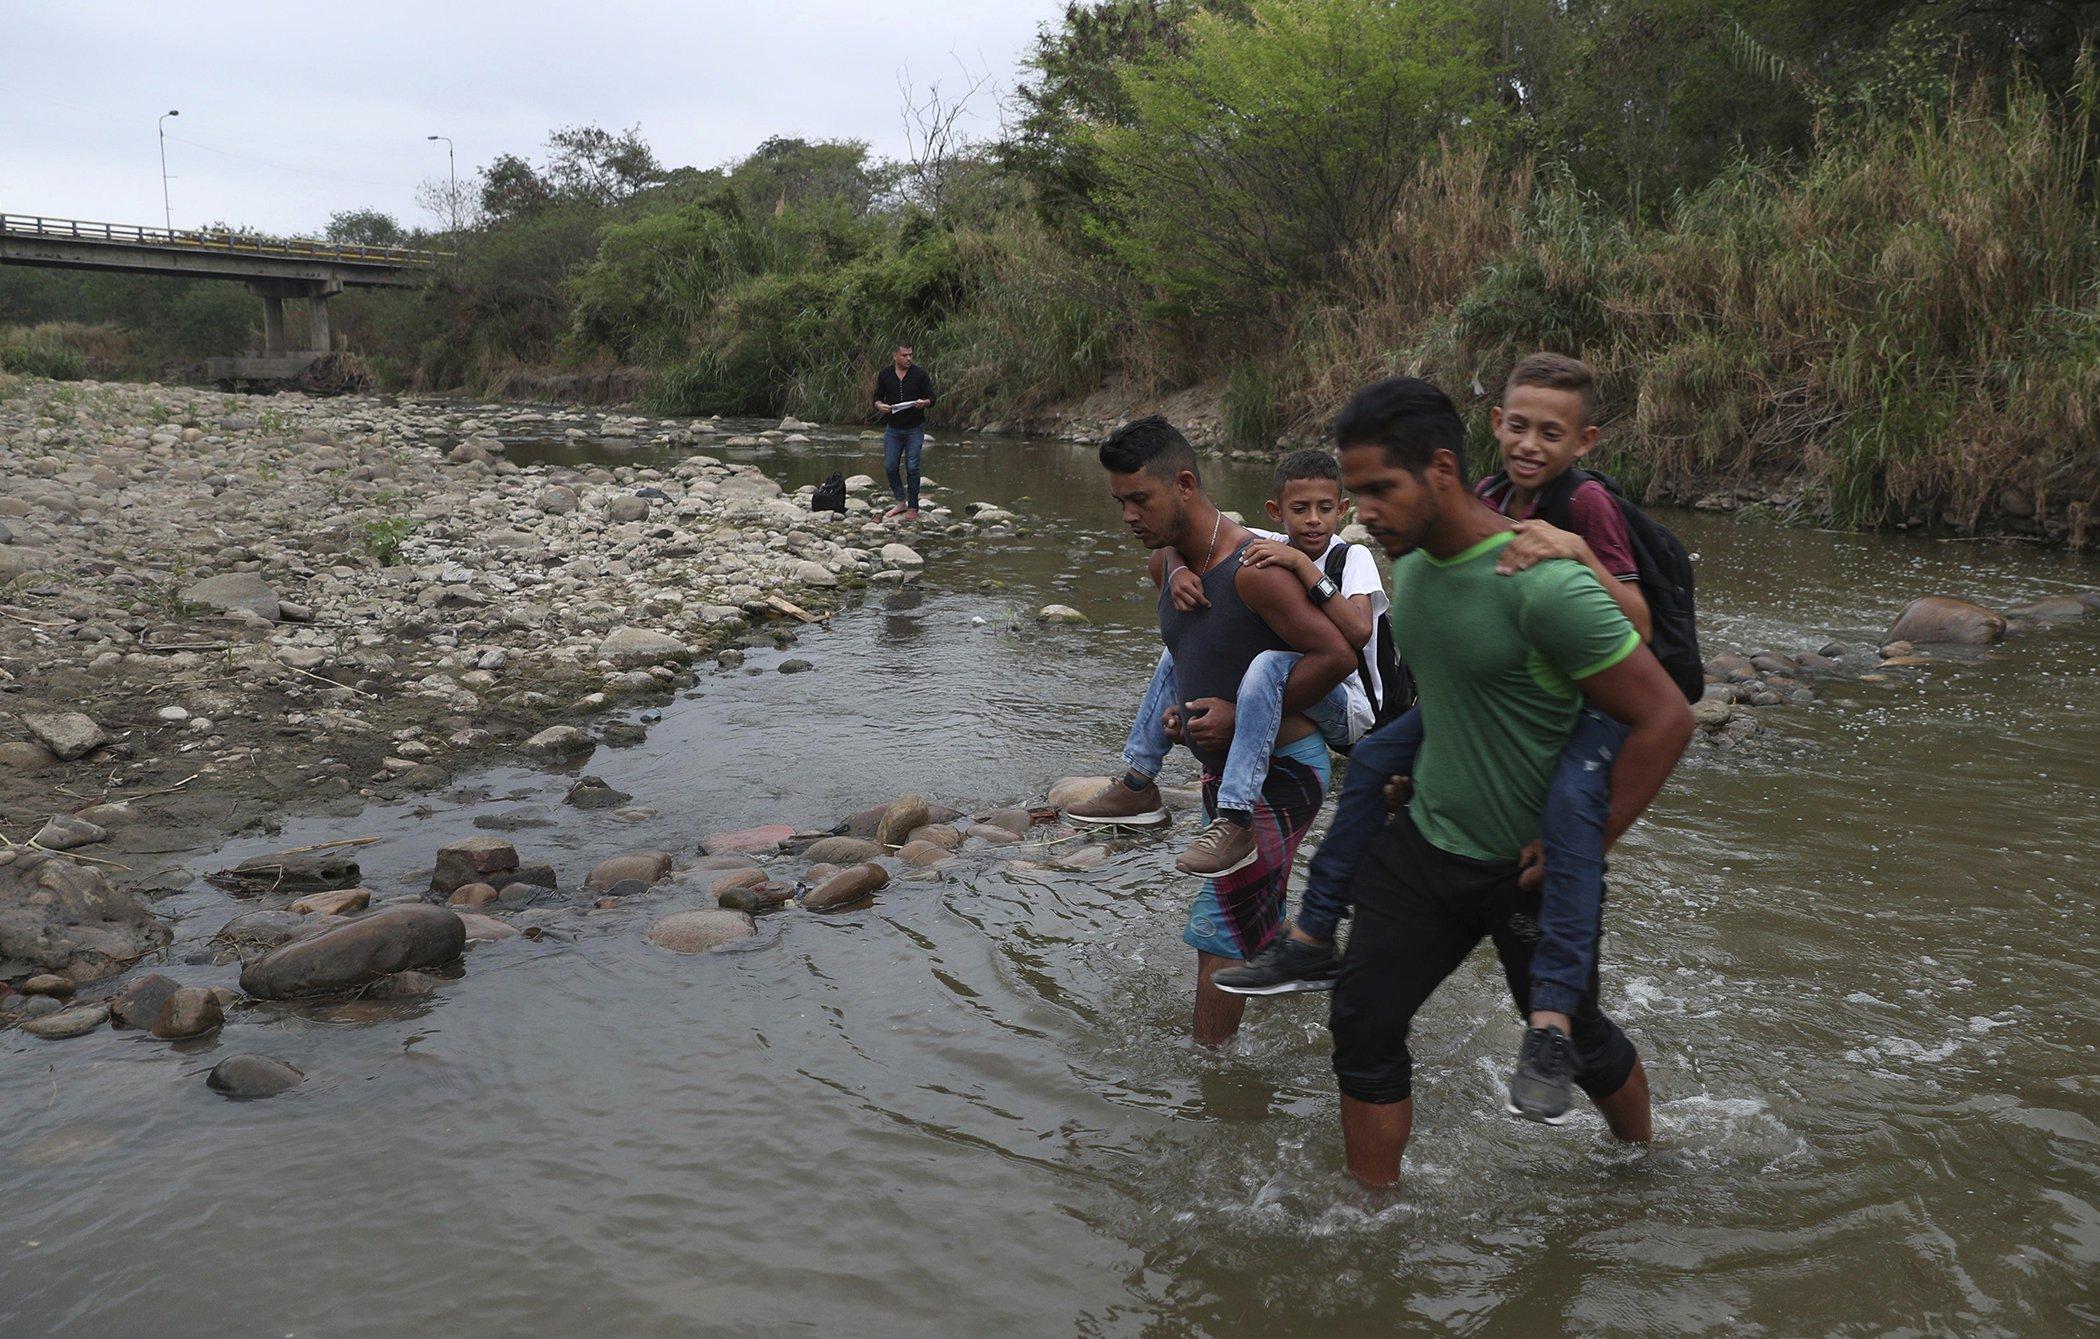 Venezuela-Migrant-Refugees-Political-Crisis.jpg